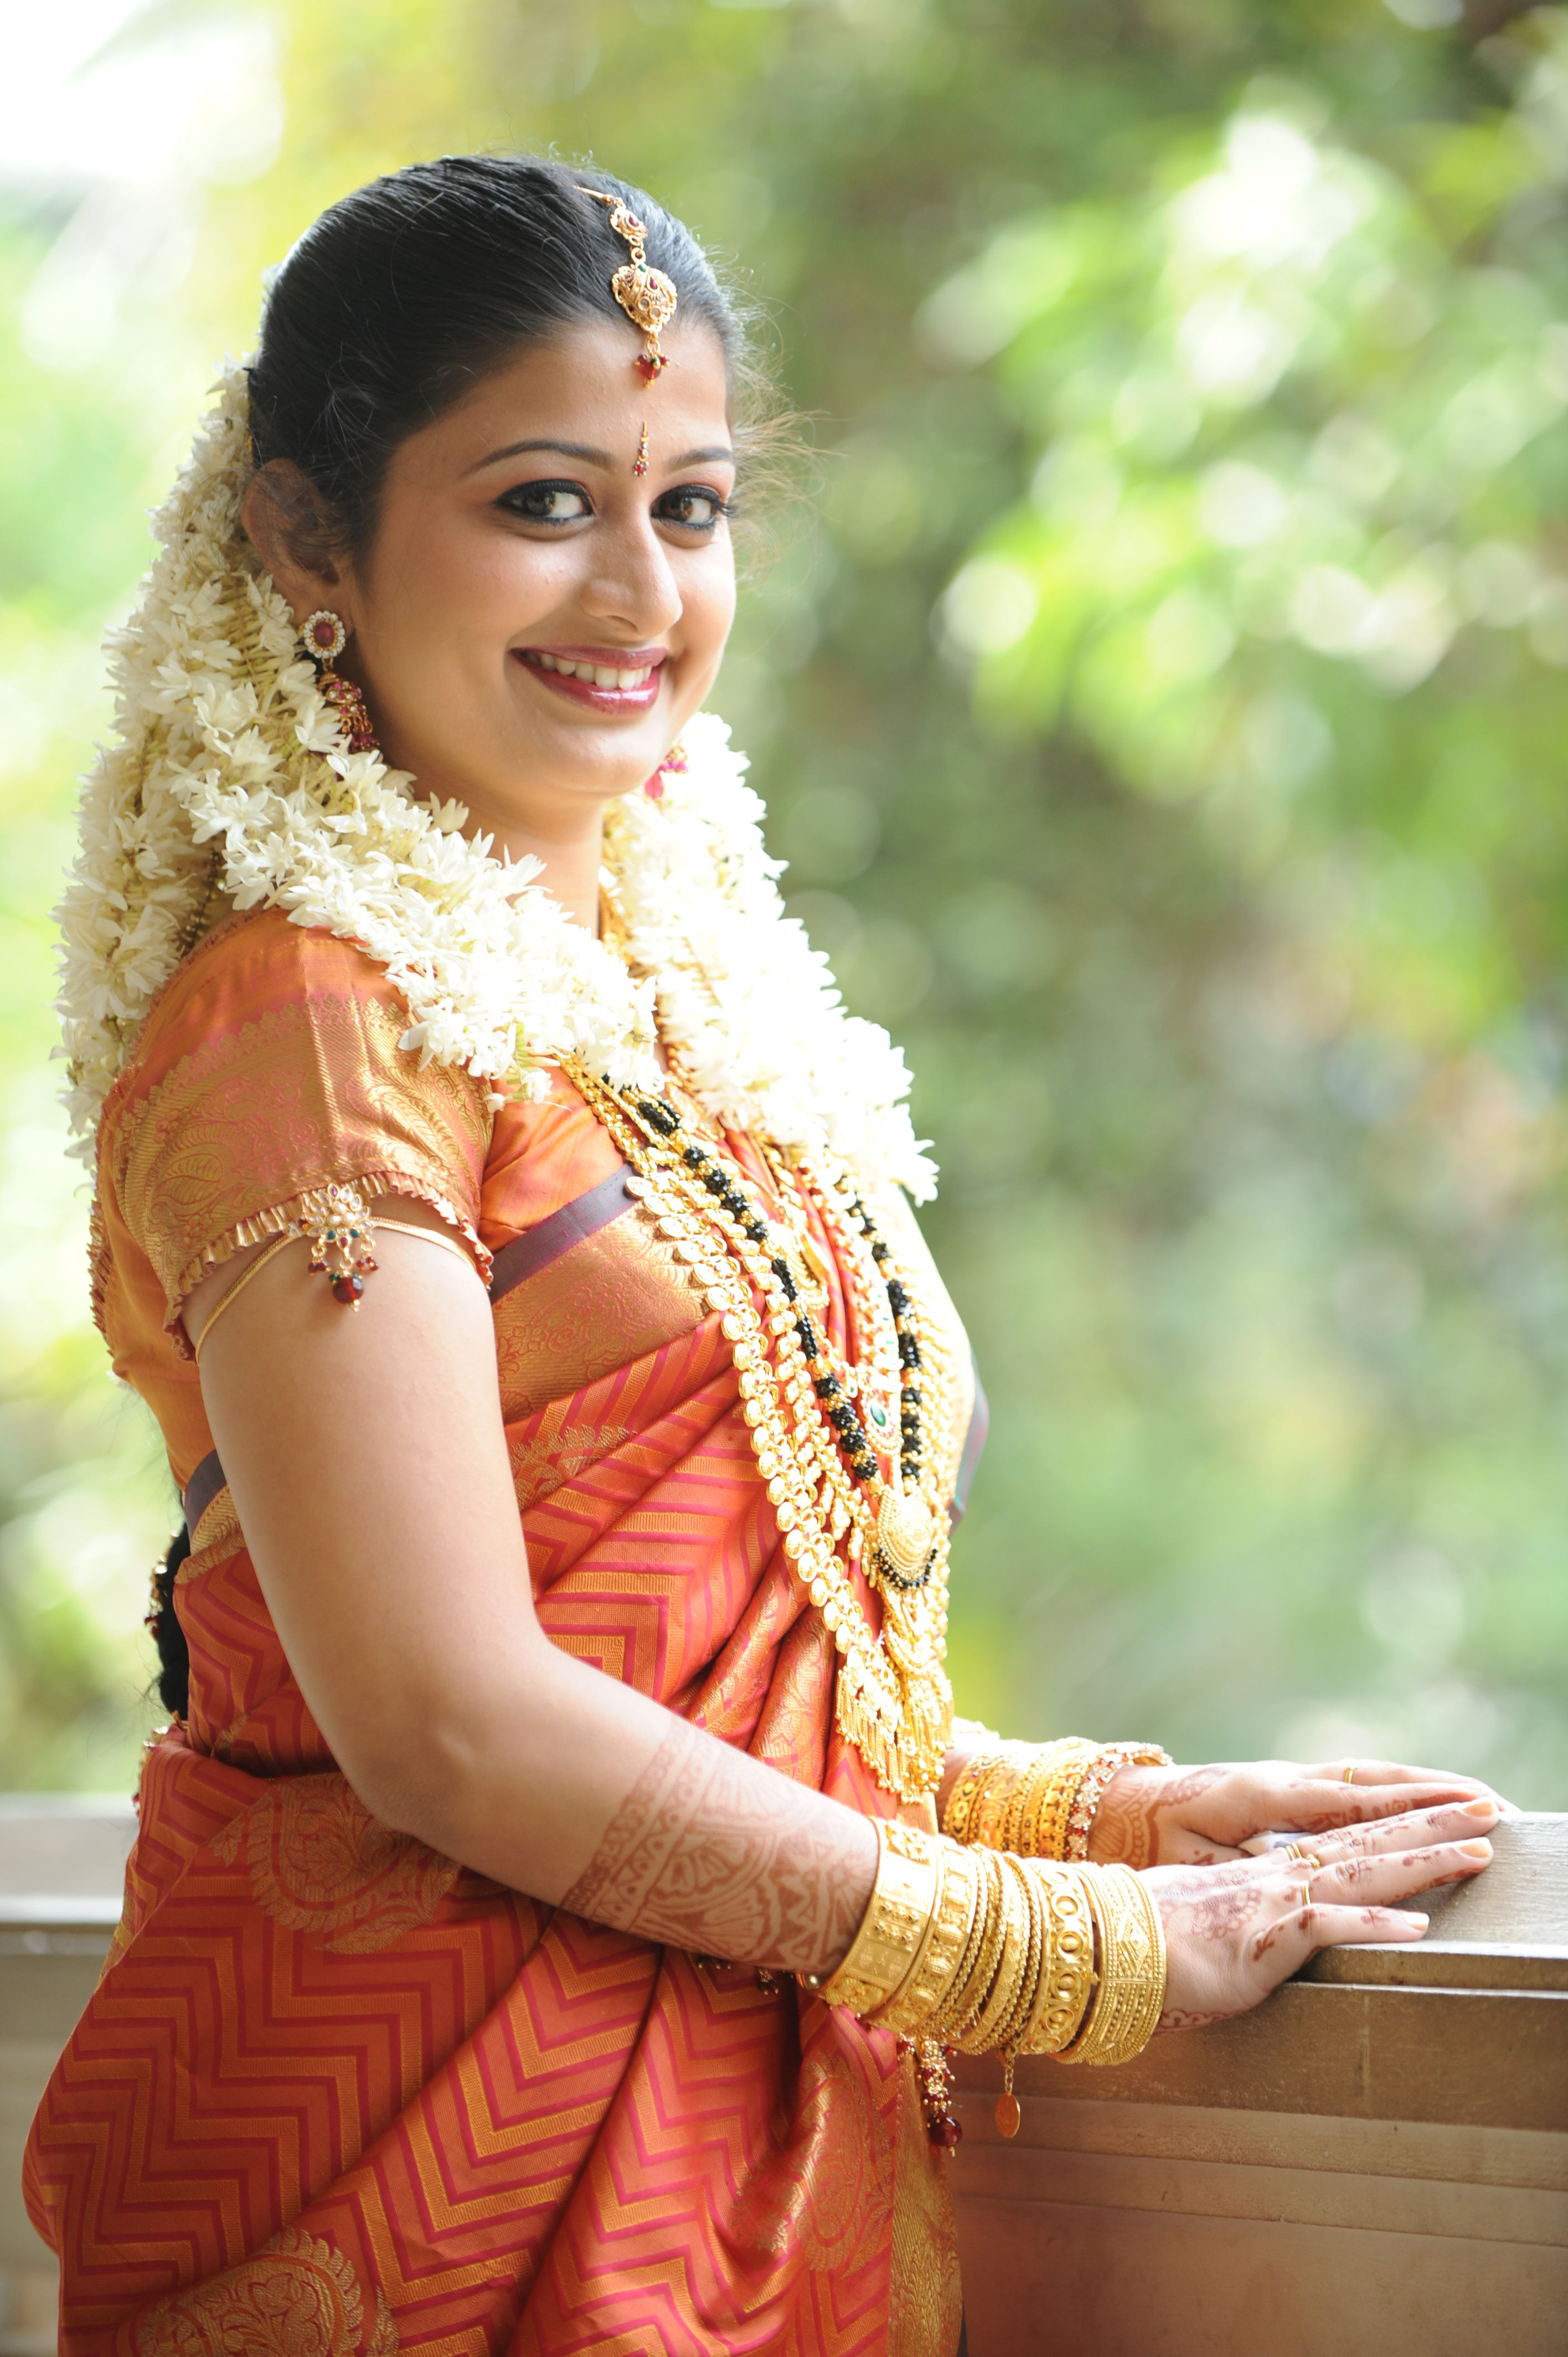 Kerala Wedding Makeup Visit Us At Imagebeautyparlour For